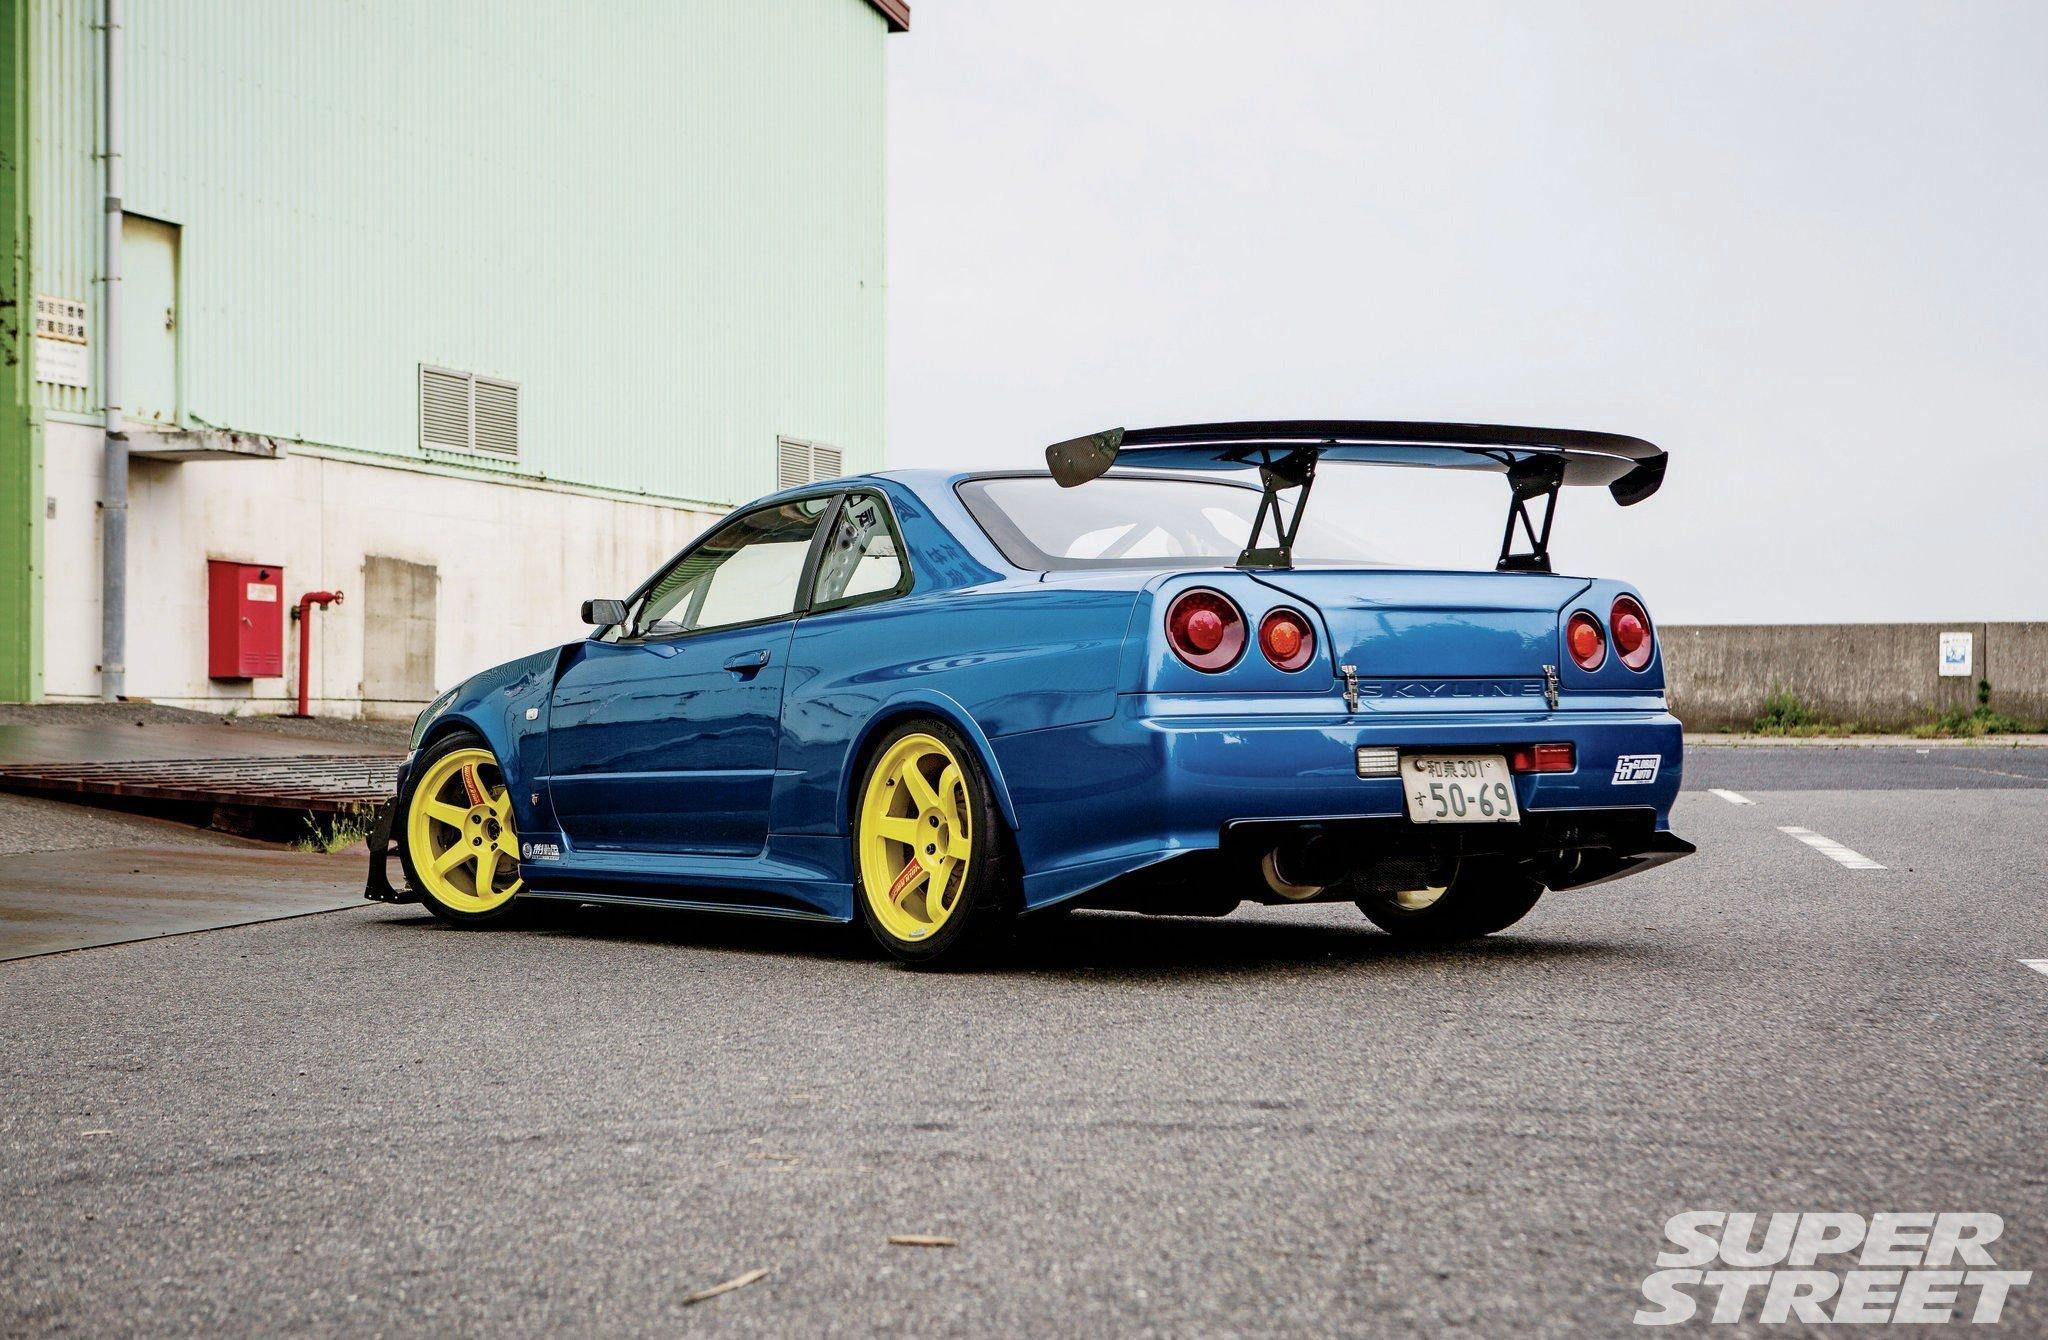 Hd Tune Up Cars Wallpaper 999 Nissan Skyline Gtr Blue Modified Cars Wallpaper